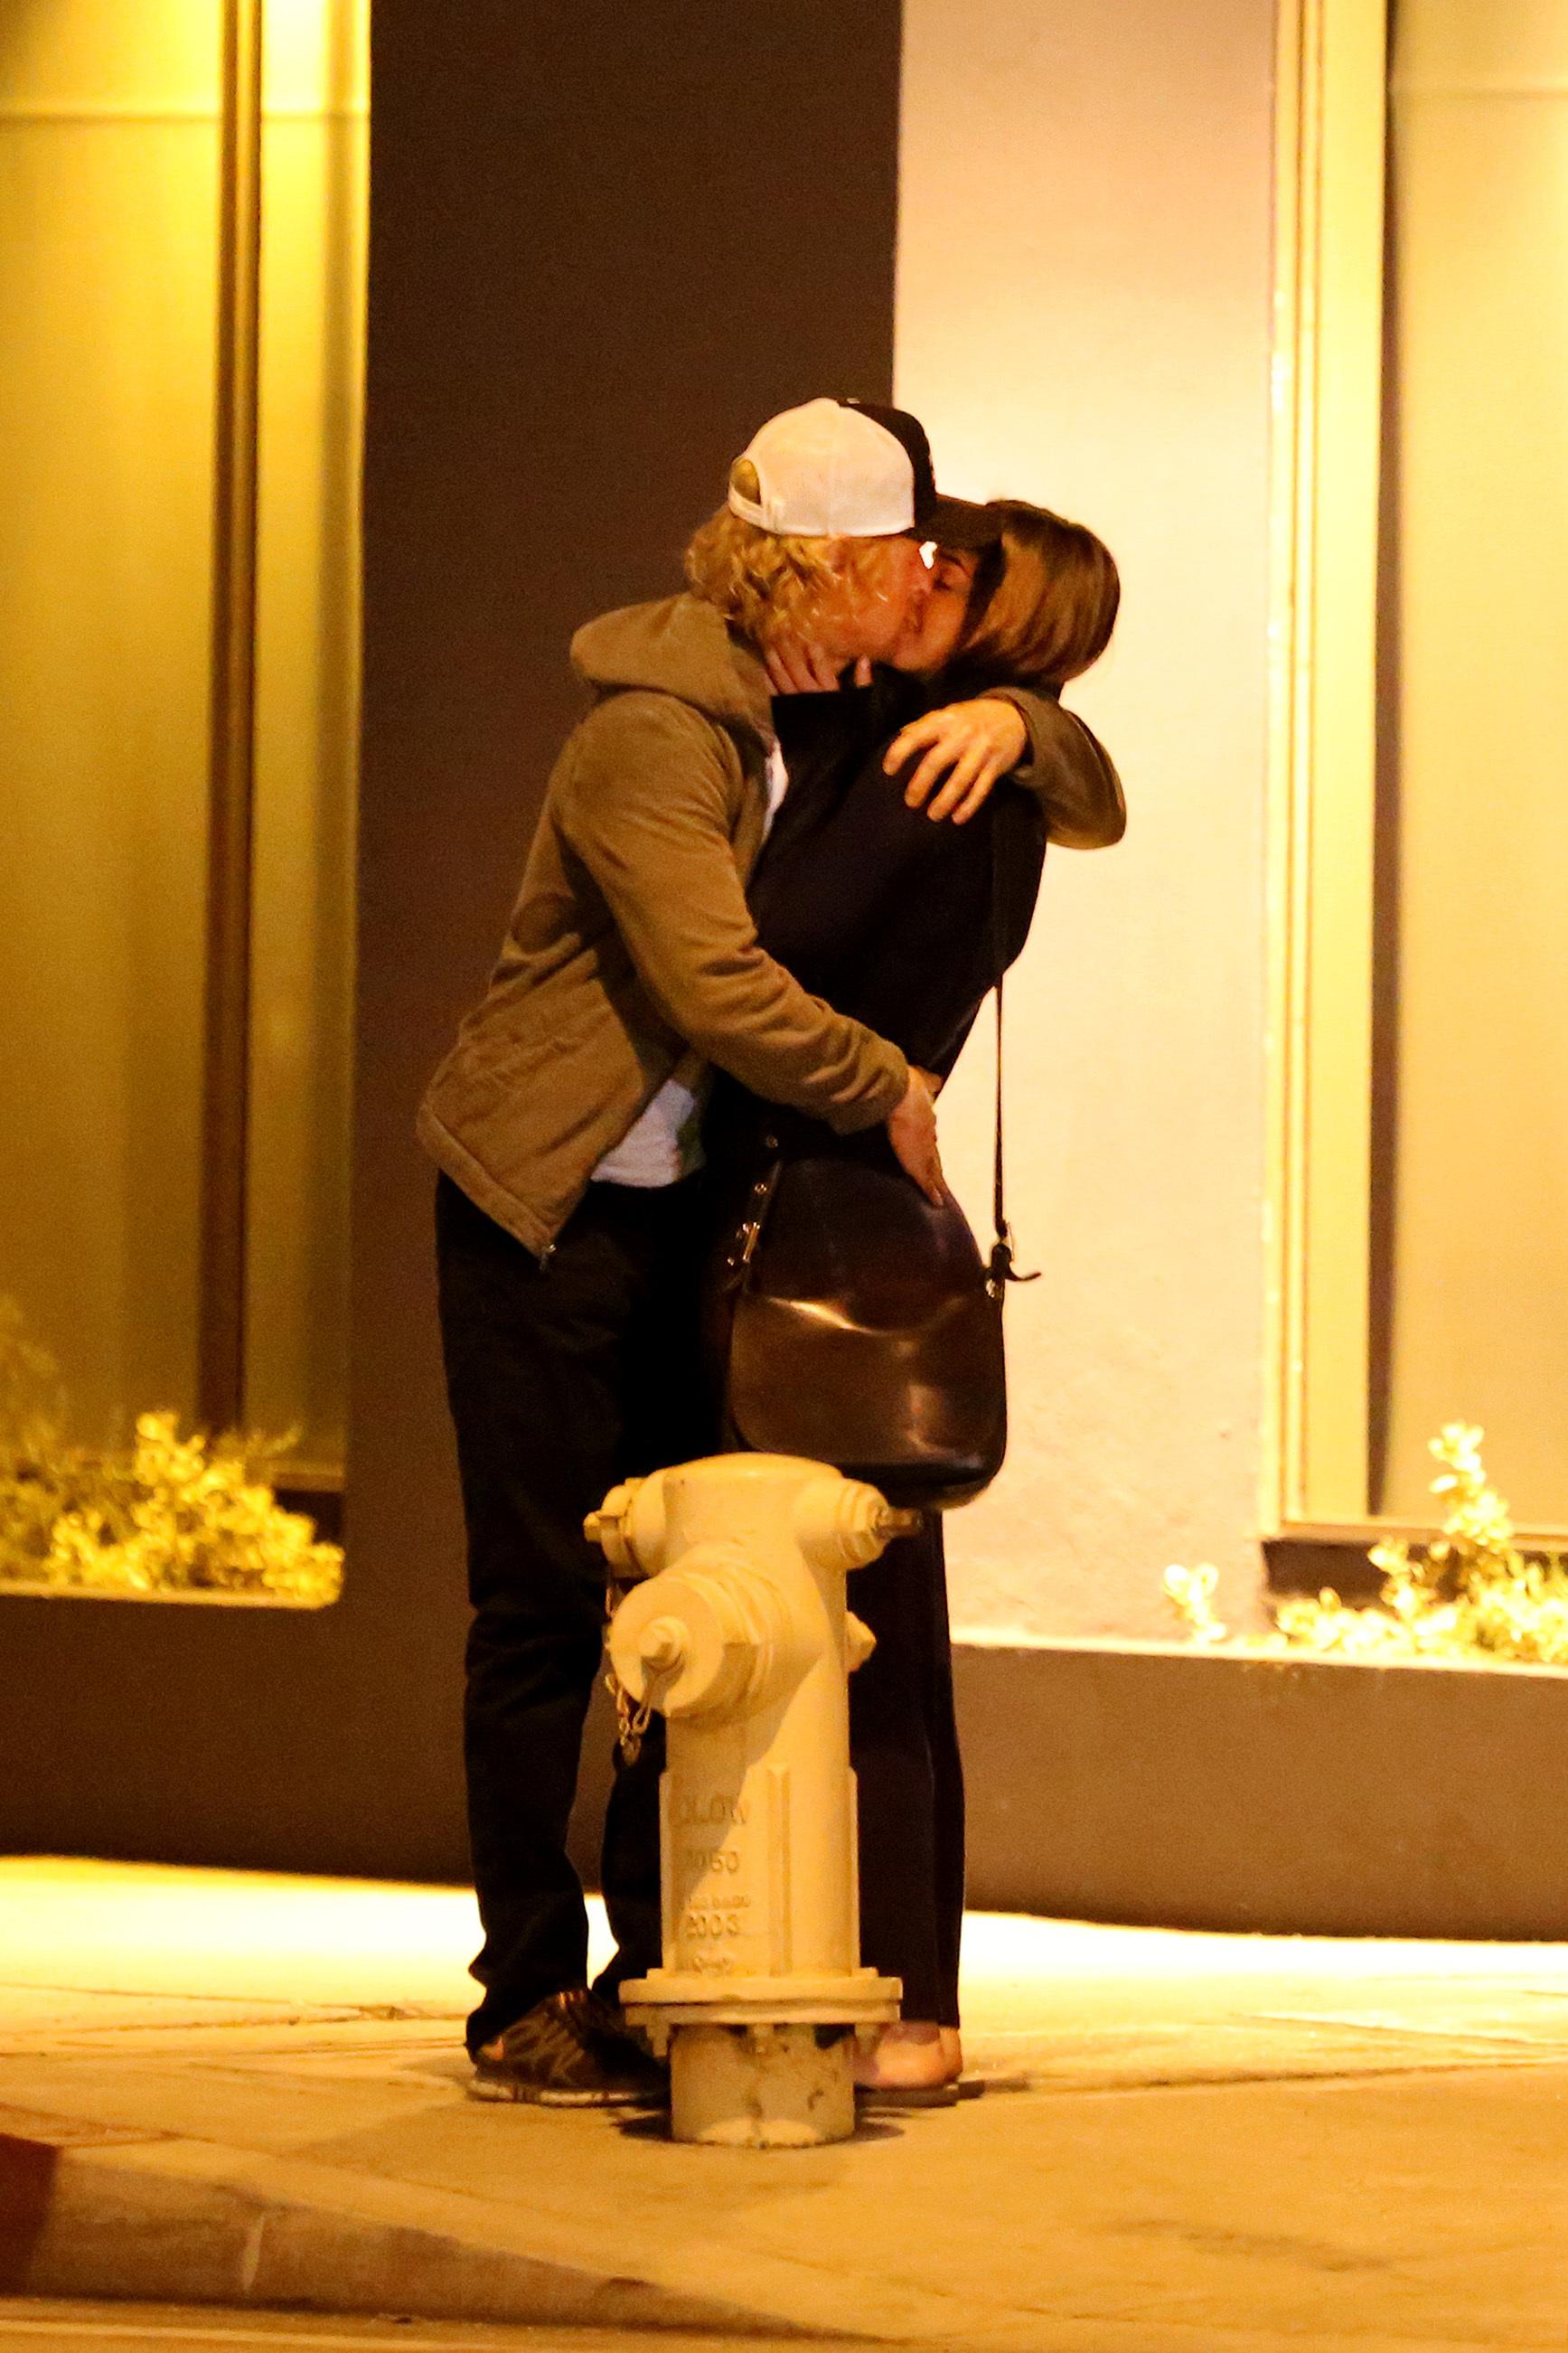 Owen WIlson kissing